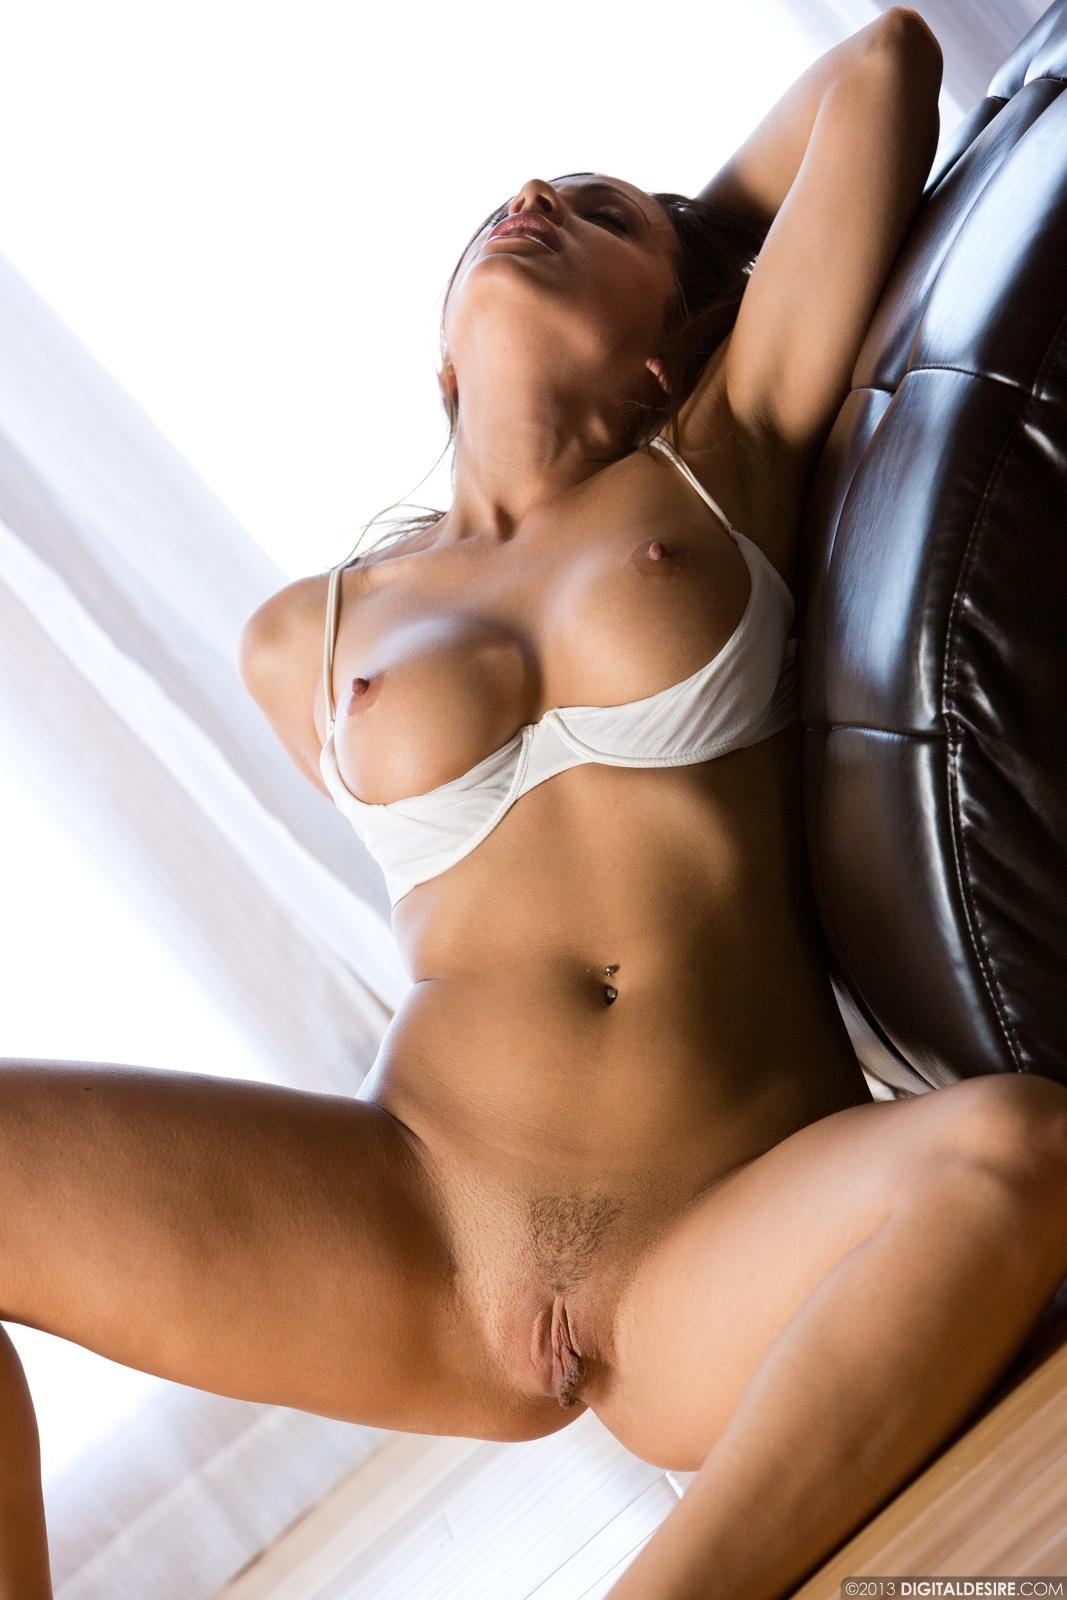 Abigail Mac Porn Happy Verday digital desire abigail mac takes off her white dress 78135